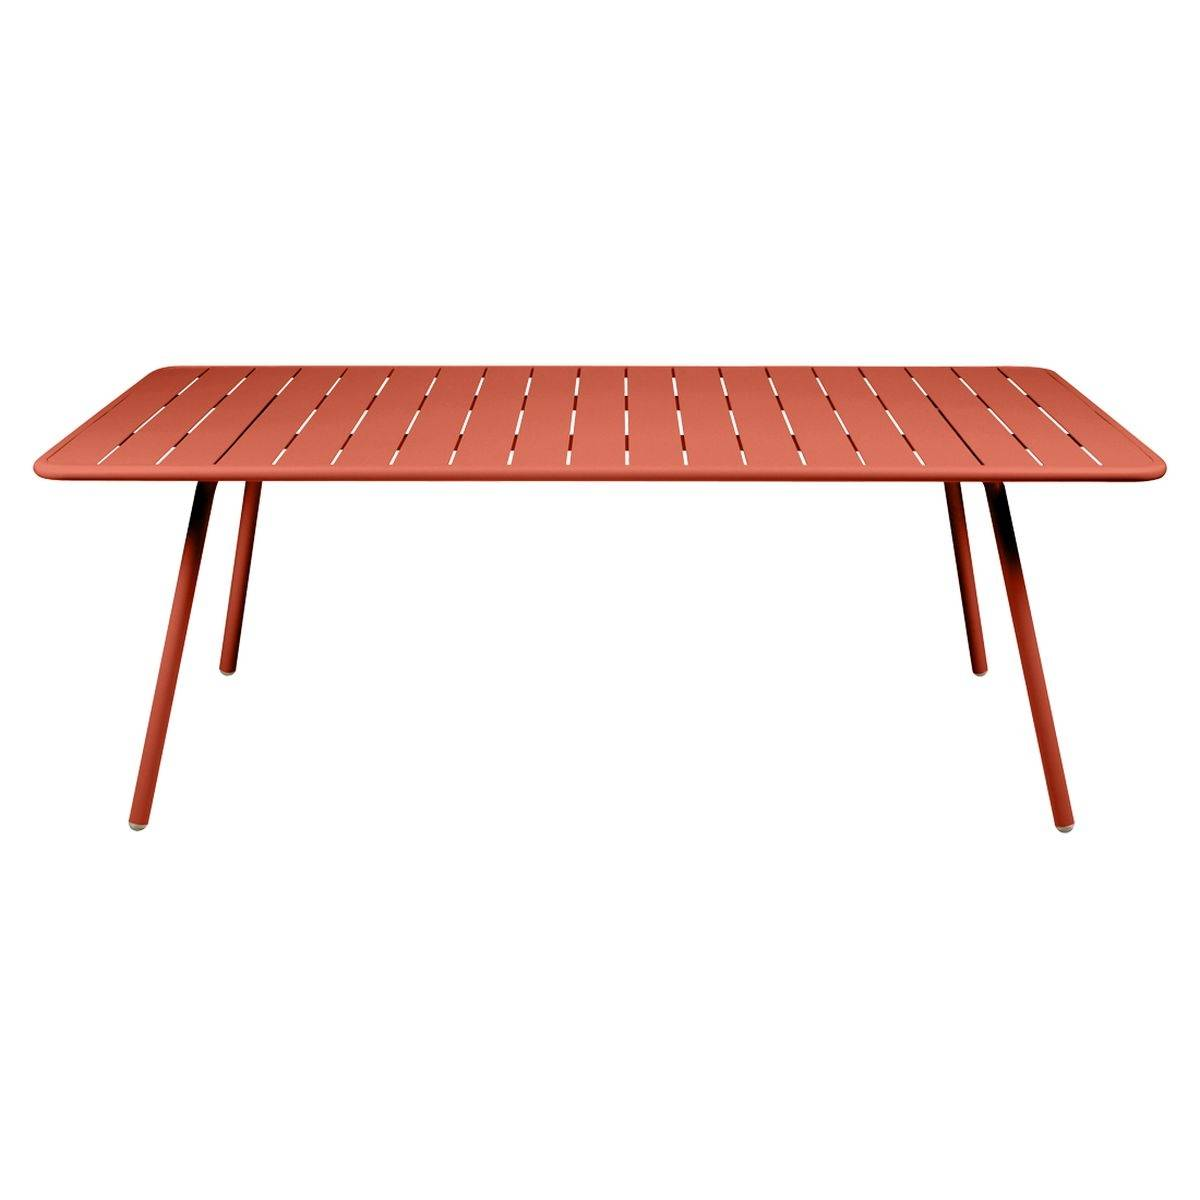 Luxembourg table 207 x 100cm luxembourg modern outdoor furniture jardin - Table jardin moderne dijon ...